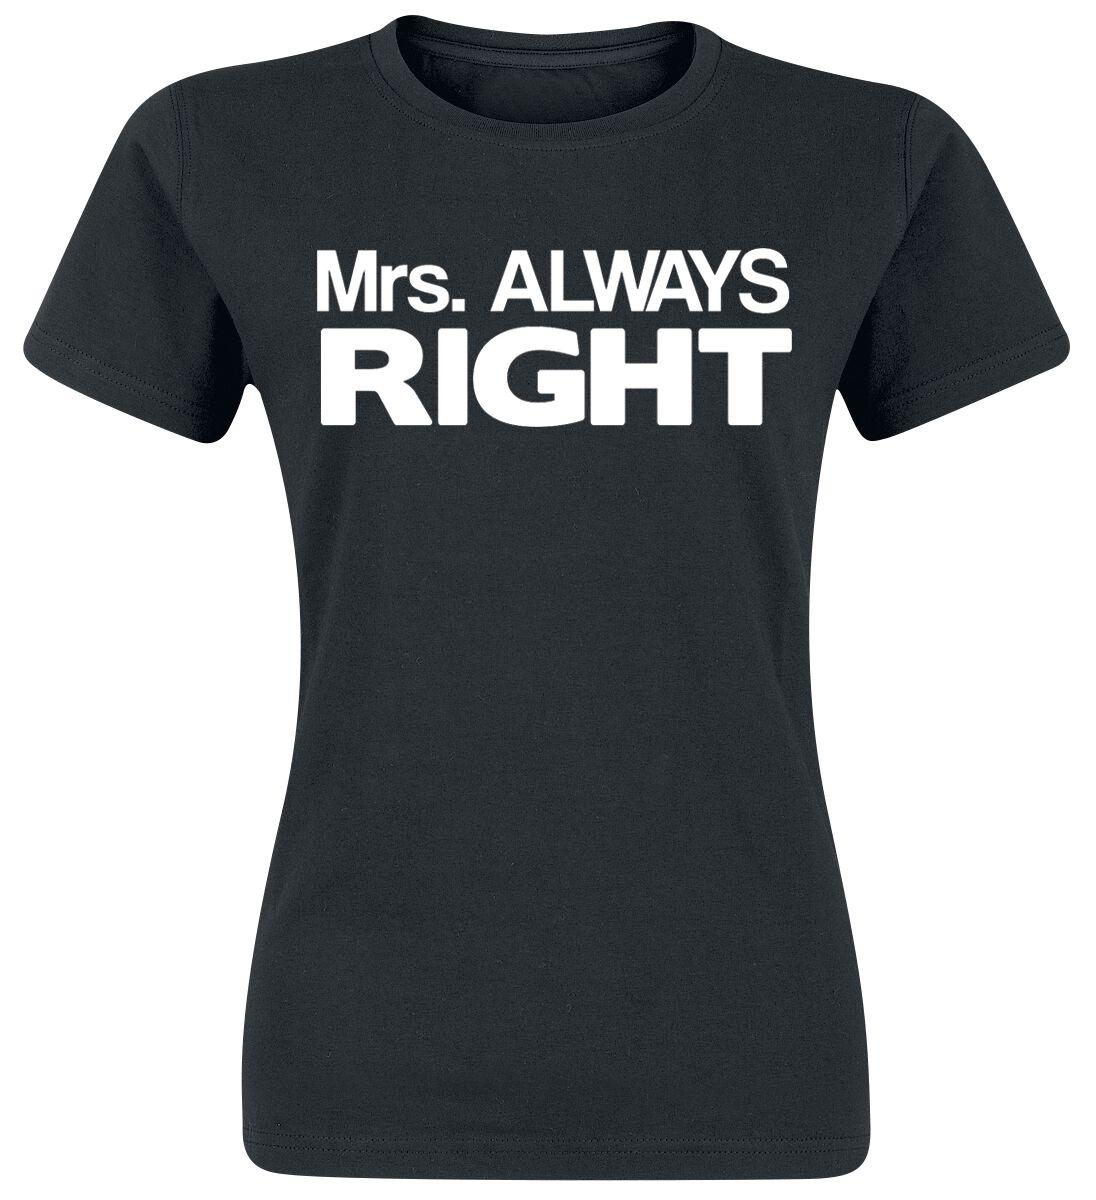 Fun Shirts - Koszulki - Koszulka damska Family Mrs. Always Right Koszulka damska czarny - 376595